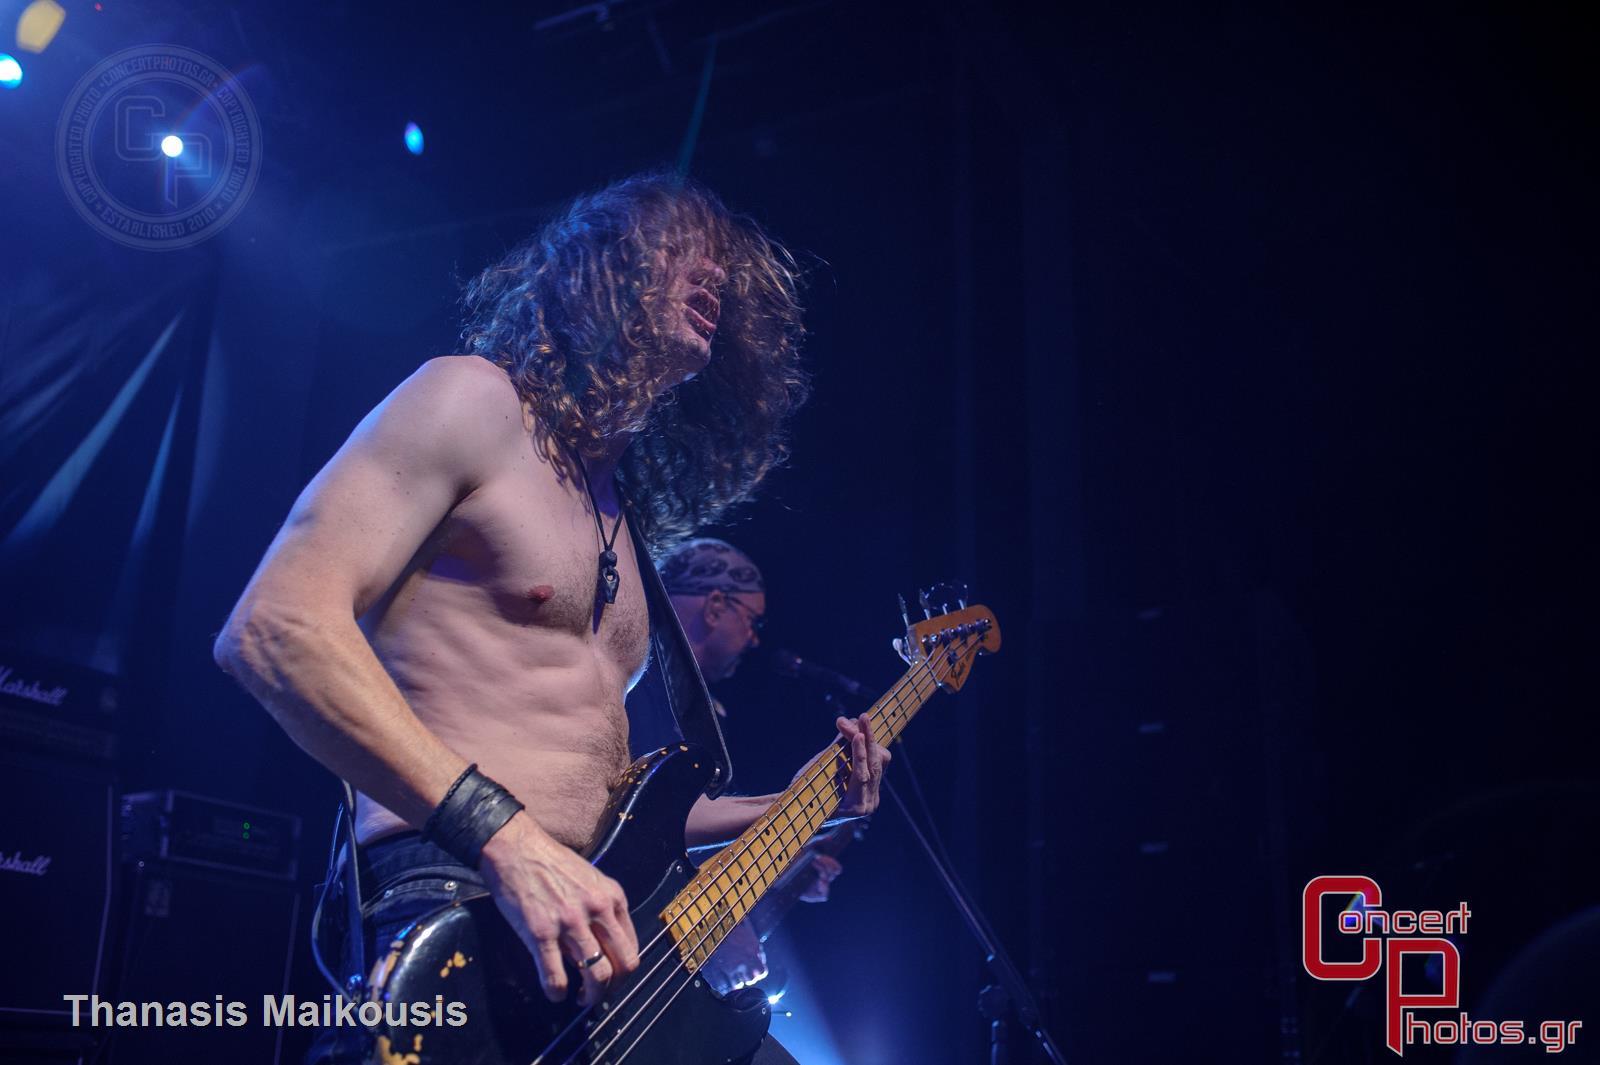 Saxon & Innerwish -Saxon Innerwish Gagarin photographer: Thanasis Maikousis - concertphotos_20141025_22_35_10